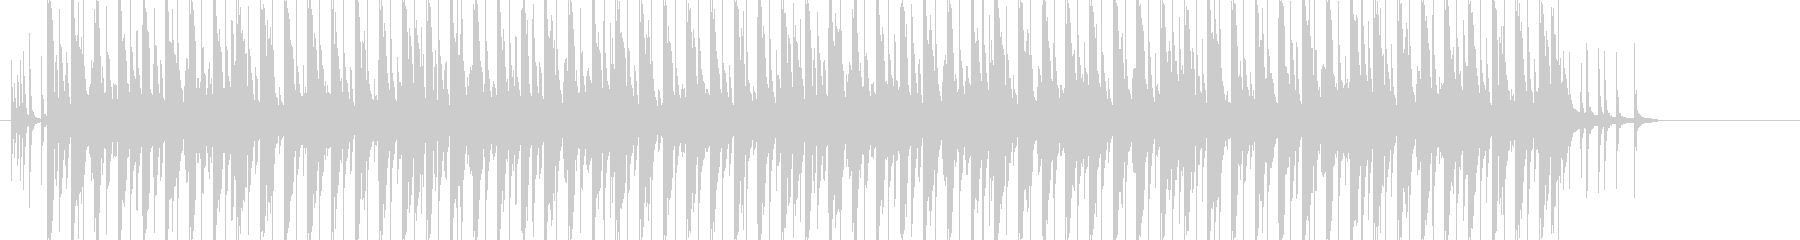 CM WEB BGM ほのぼの系の未再生の波形